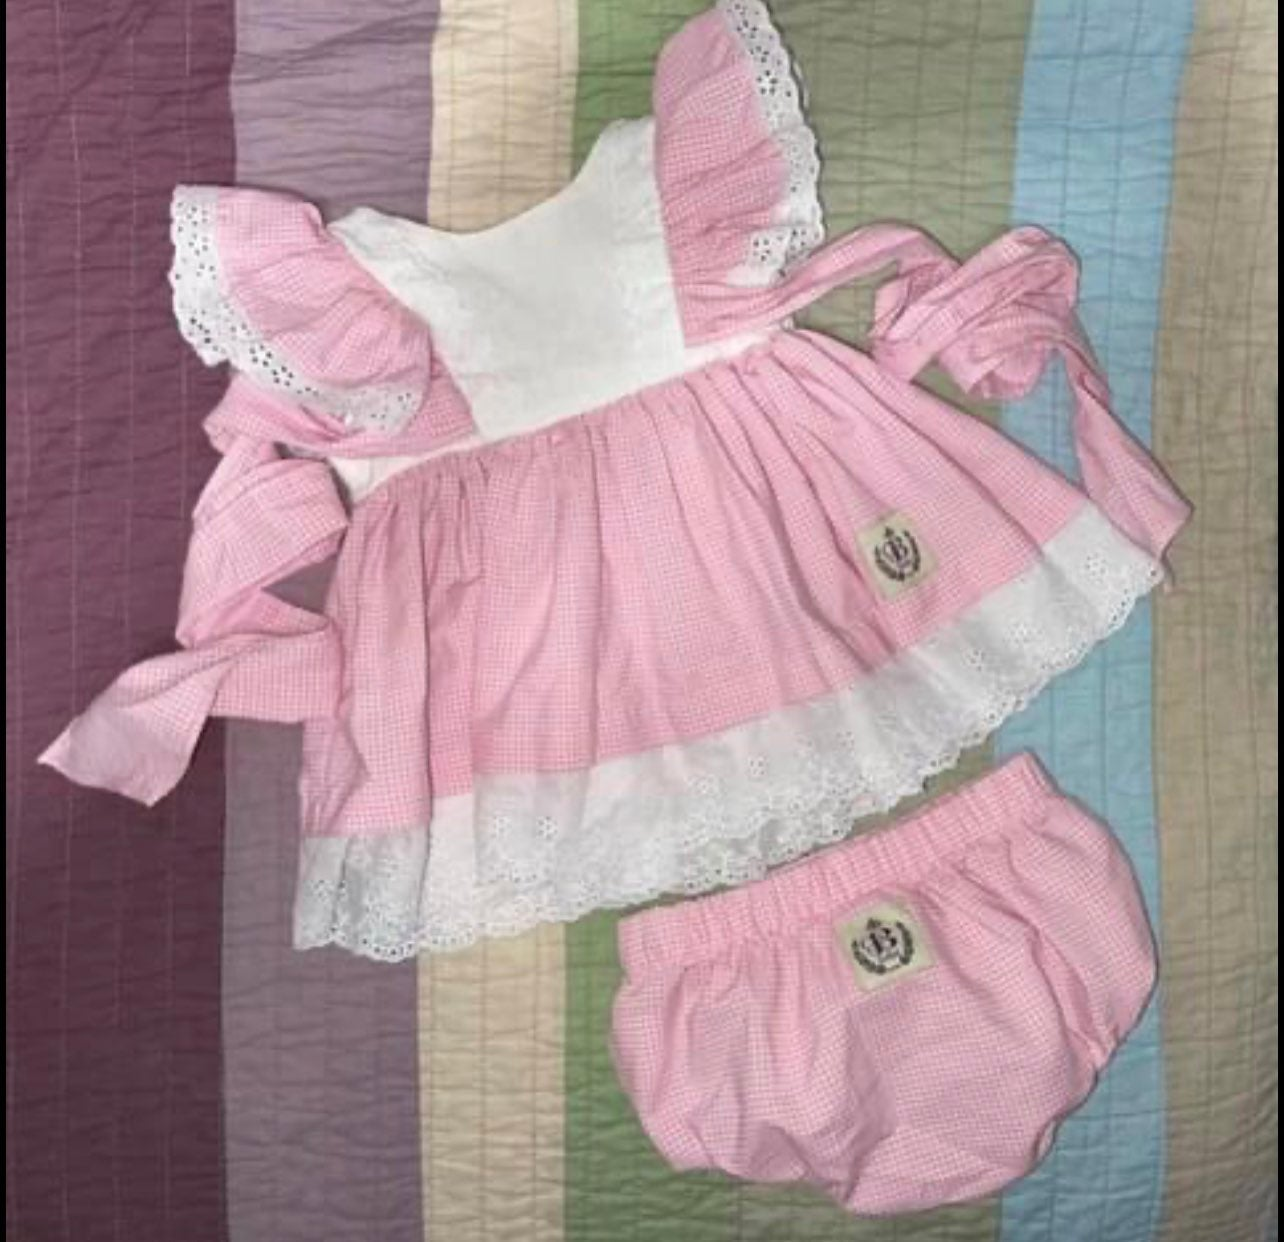 Bourgeois Bebe Pink Gingham Set - 6 mo